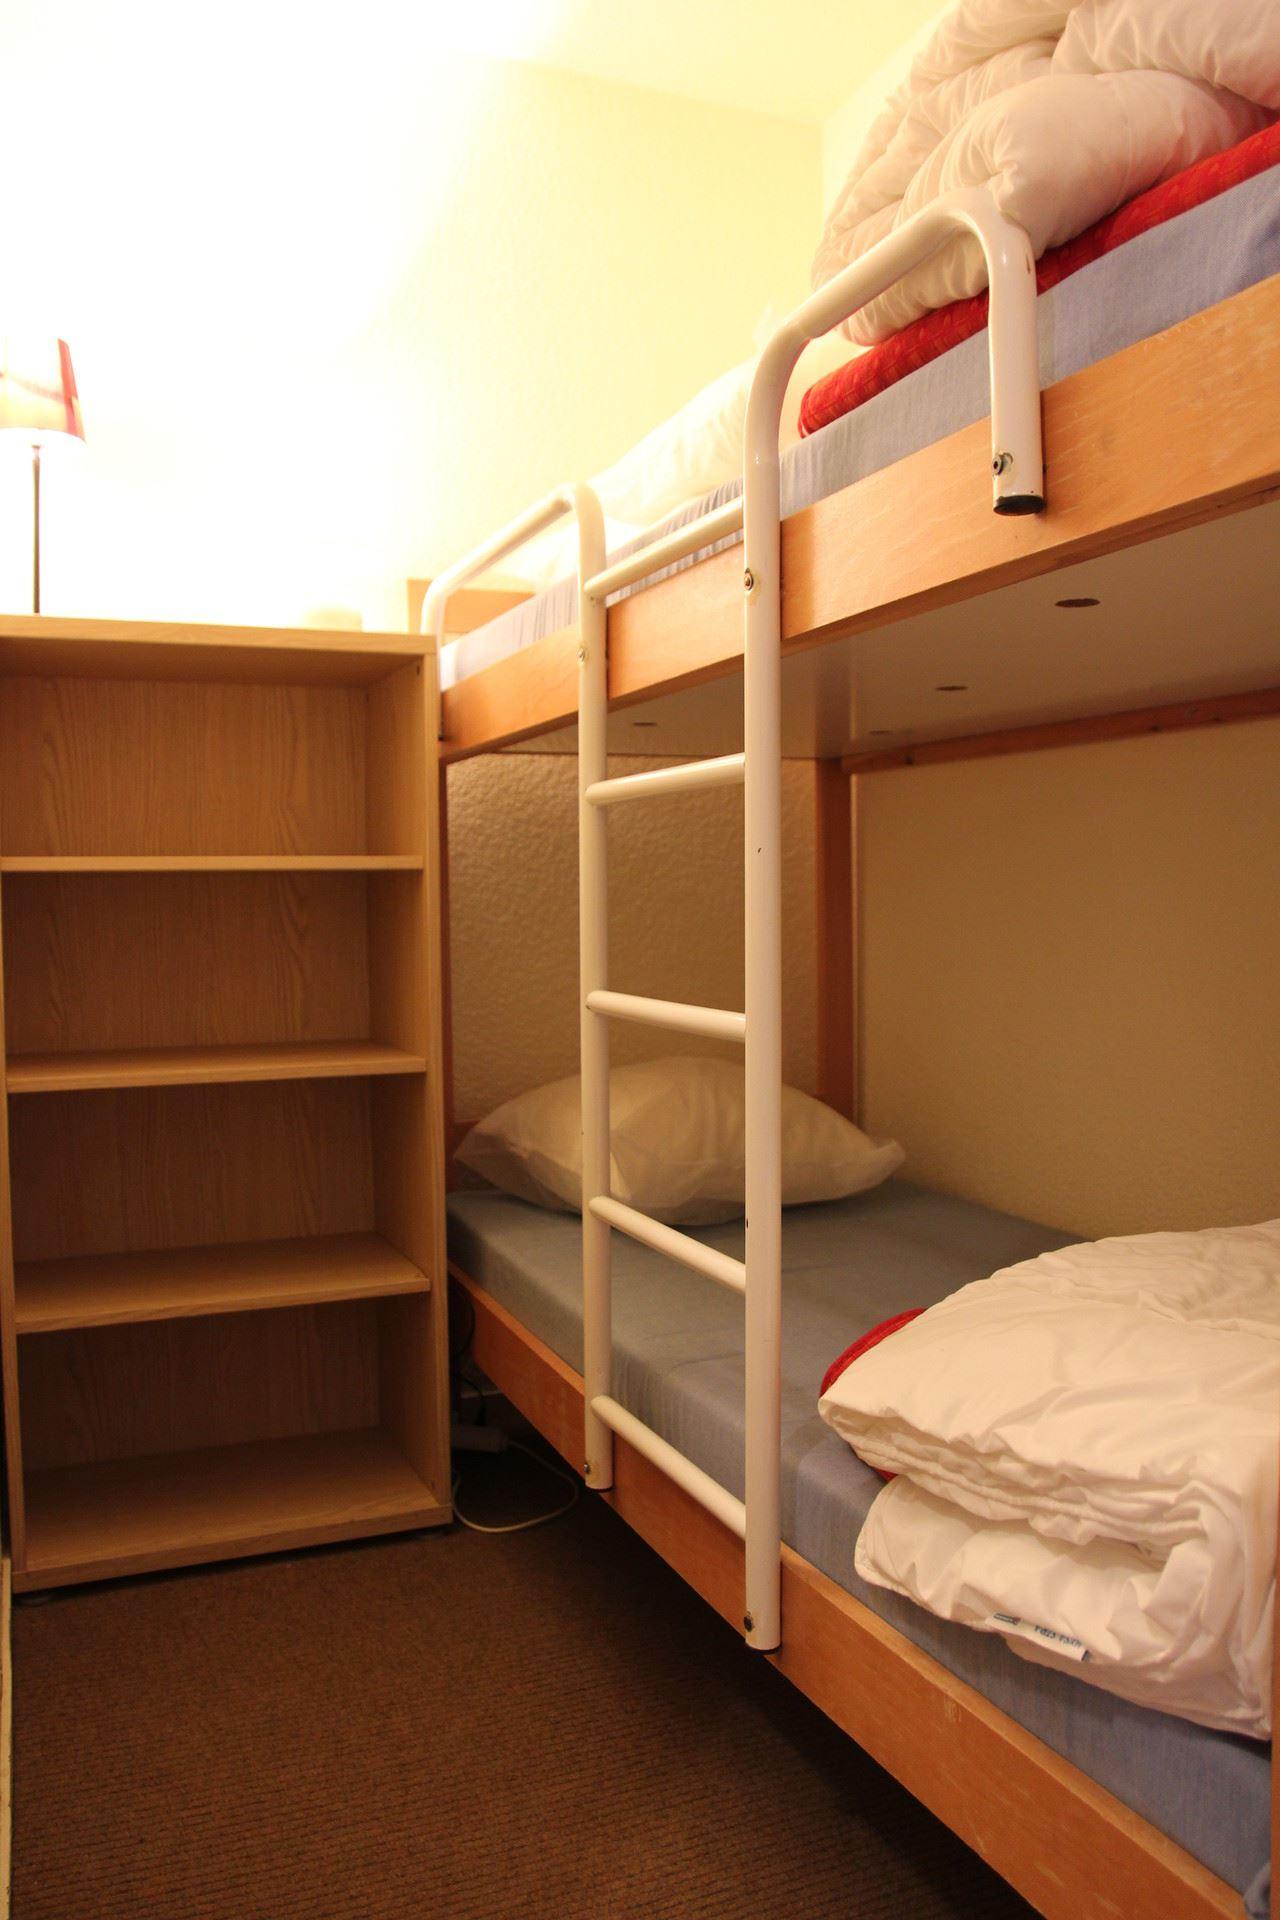 SCHUSS 108 / APARTMENT 2 ROOMS CABIN 6 PERSONS - 1 BRONZE SNOWFLAKE - CI